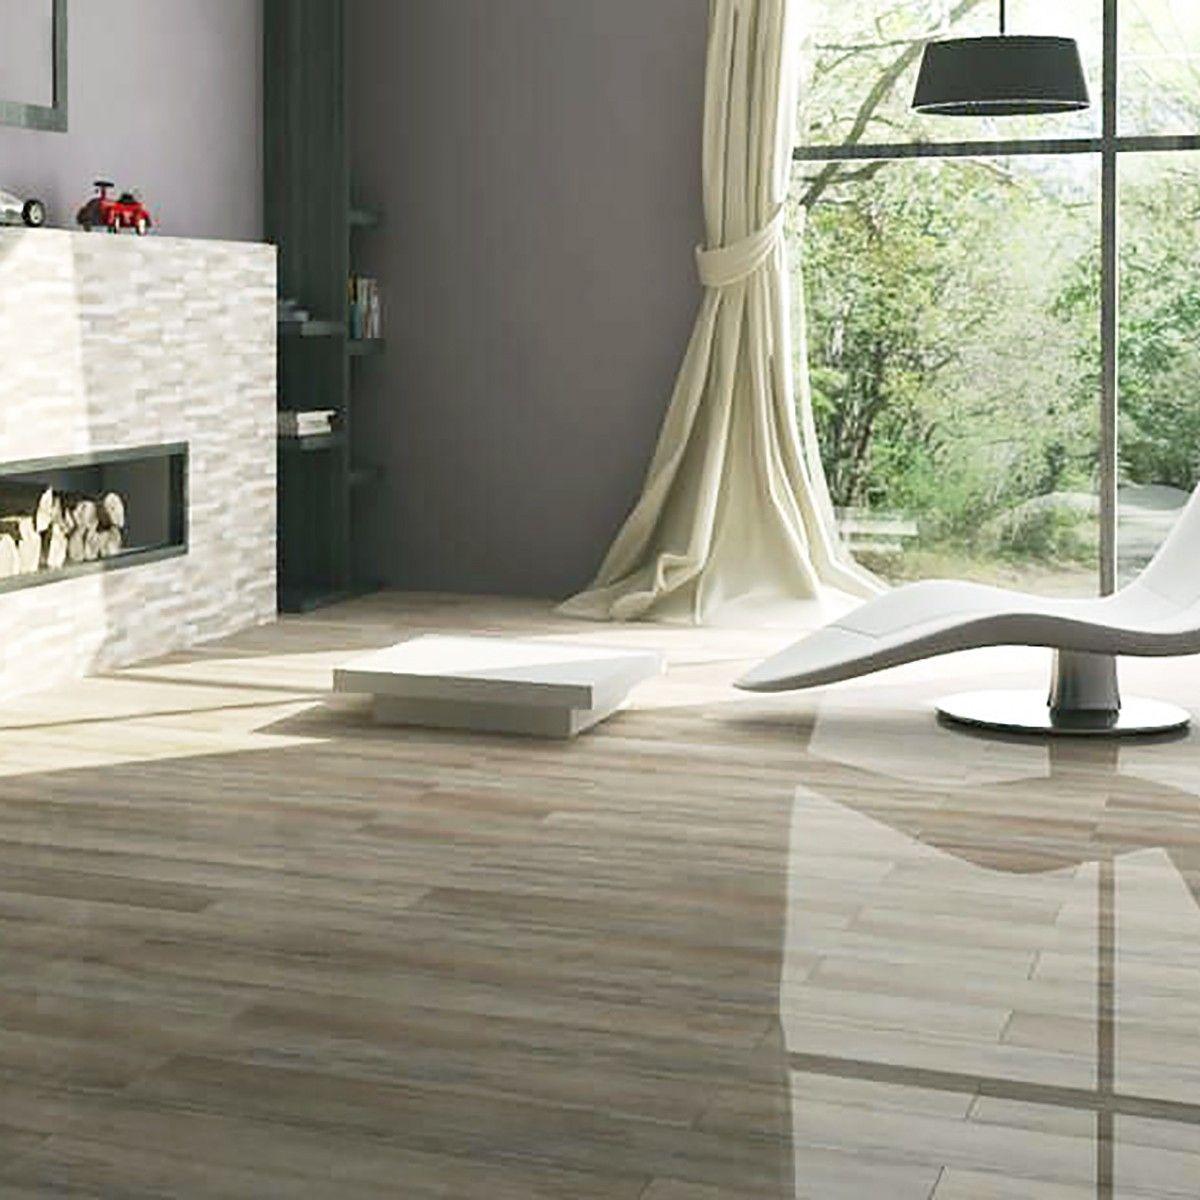 Crown Tiles 120x20 Hilton Ash Wood Effect Tiles Wood Effect Tiles Ash Wood Floor Porcelain Floor Tiles